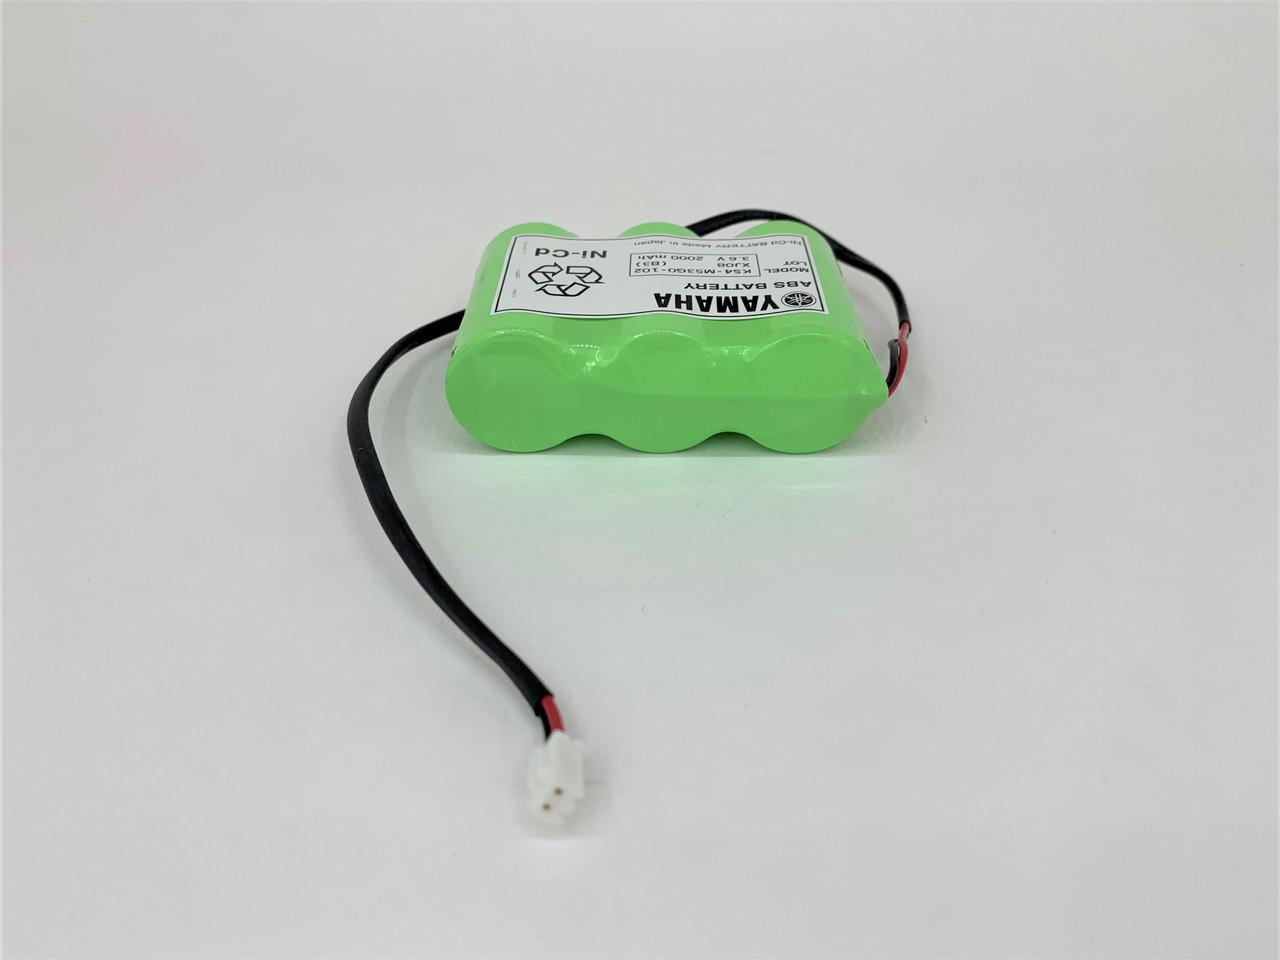 Backup Battery B3 ERCD ERCX RDX TRCX RCX143 RCX144